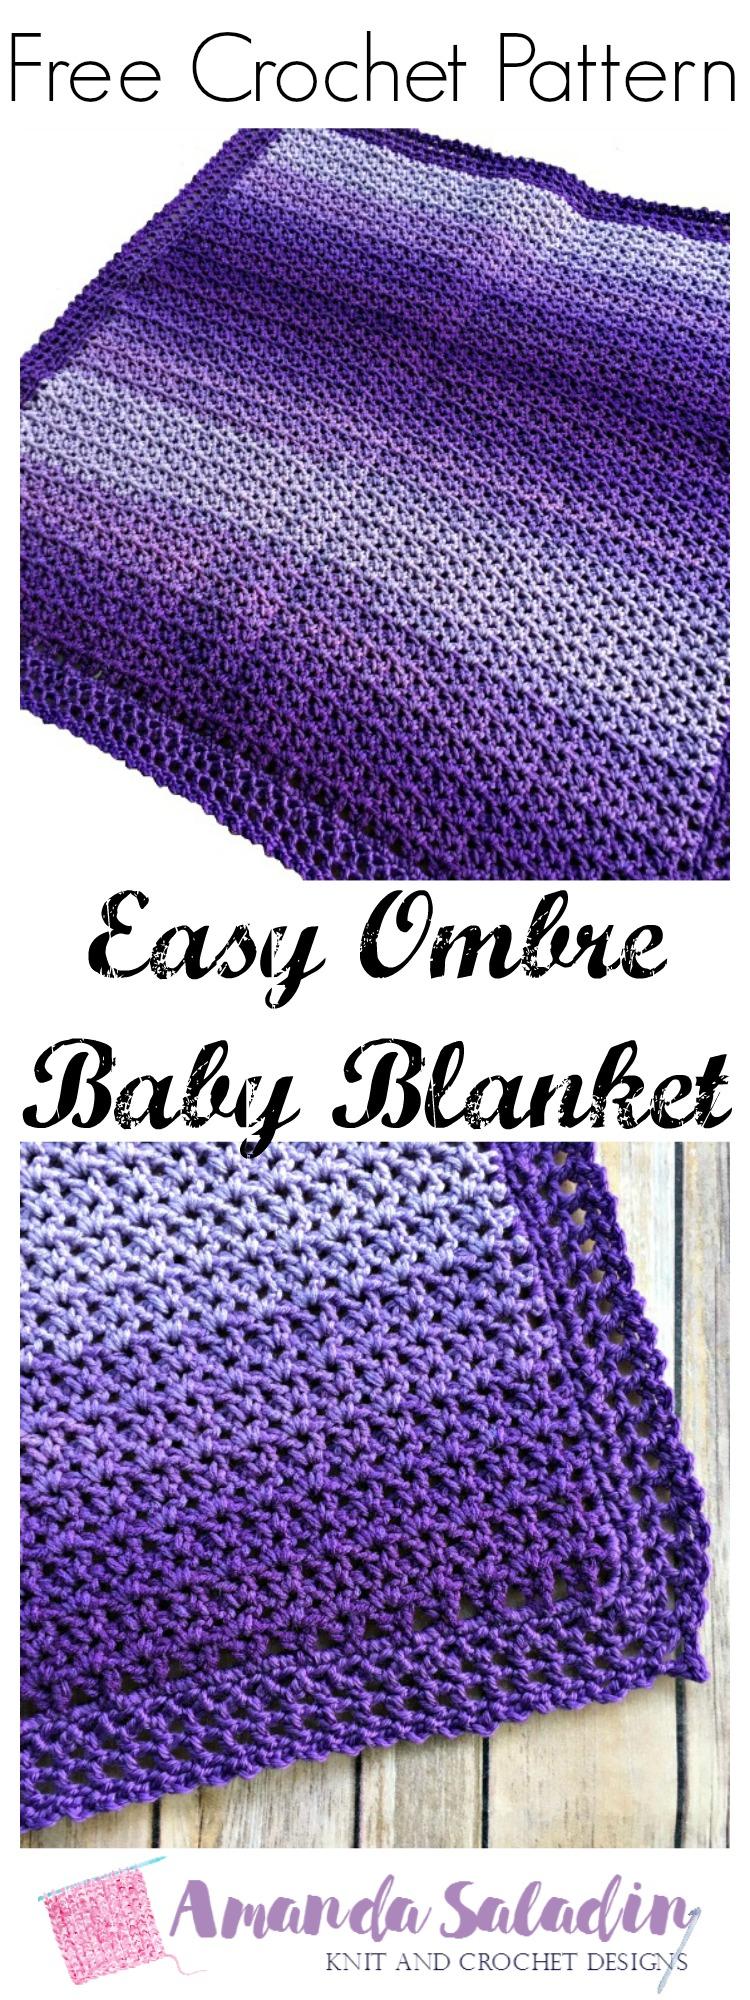 Easy Ombre Baby Blanket - Free Crochet Pattern - Amanda Saladin